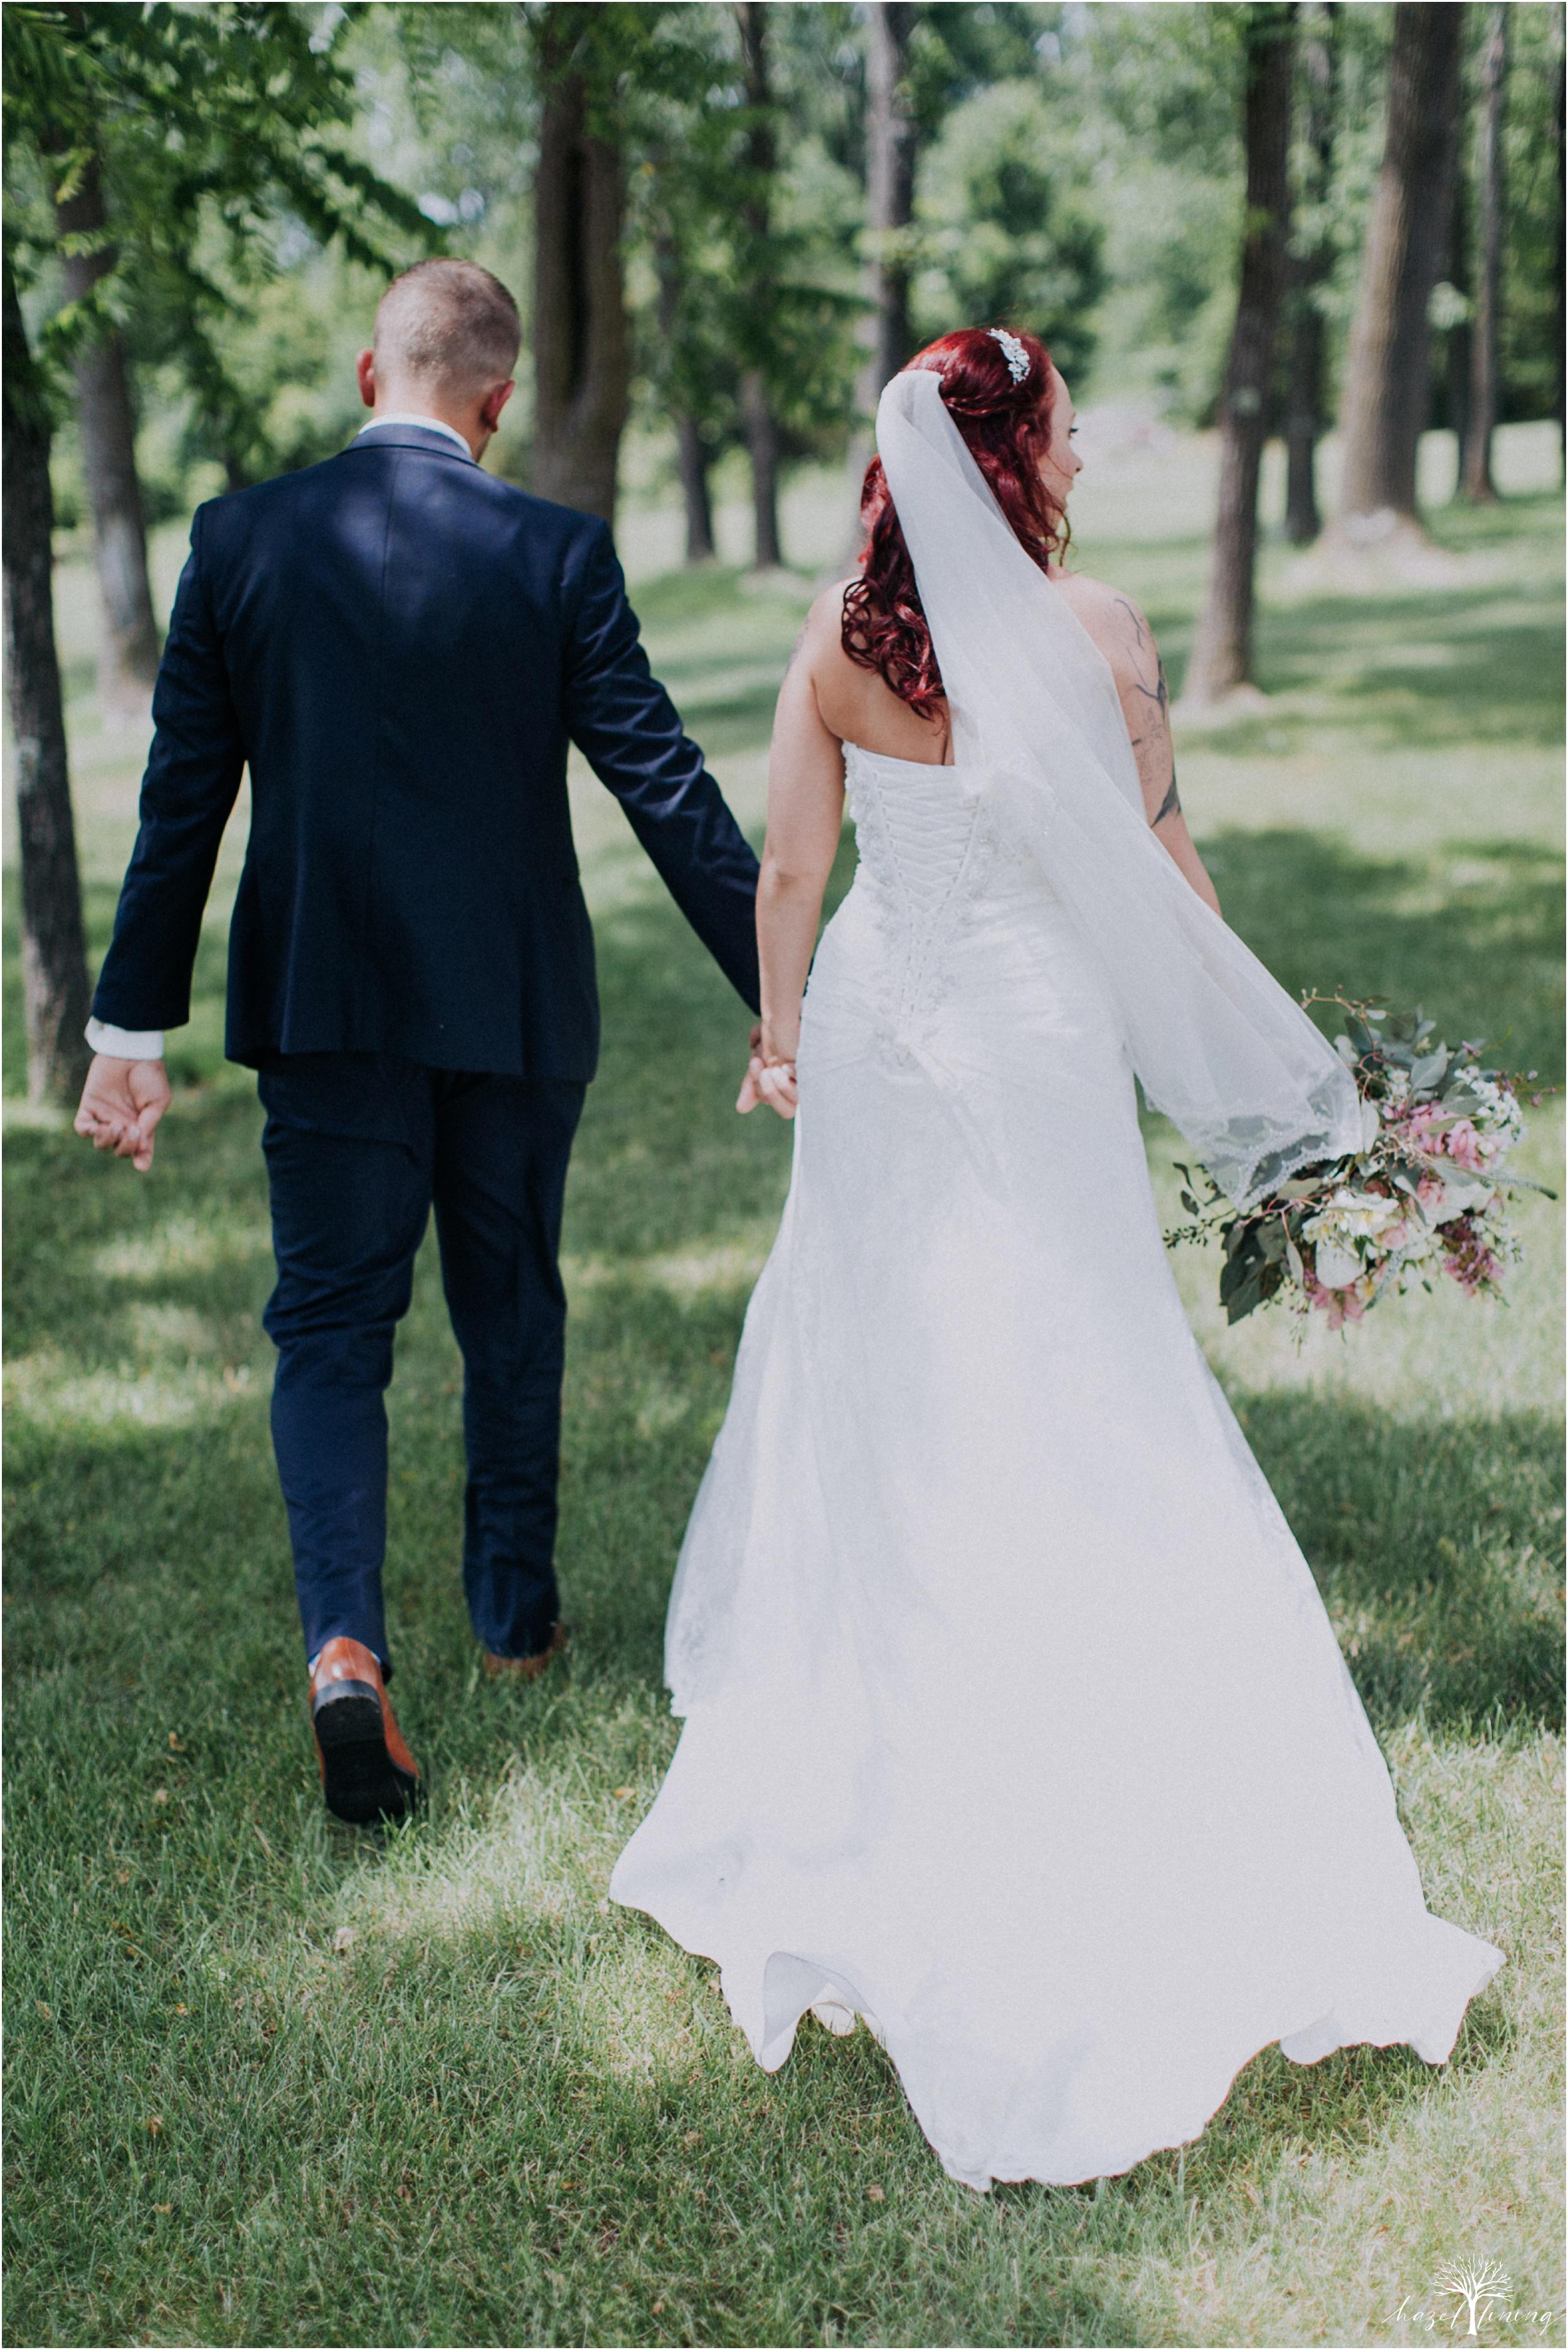 alyssa-james-stiteler-wedding-loft-and-sweet-water-cc-pennsburg-pennsylvania-hazel-lining-travel-wedding-elopement-photography_0032.jpg